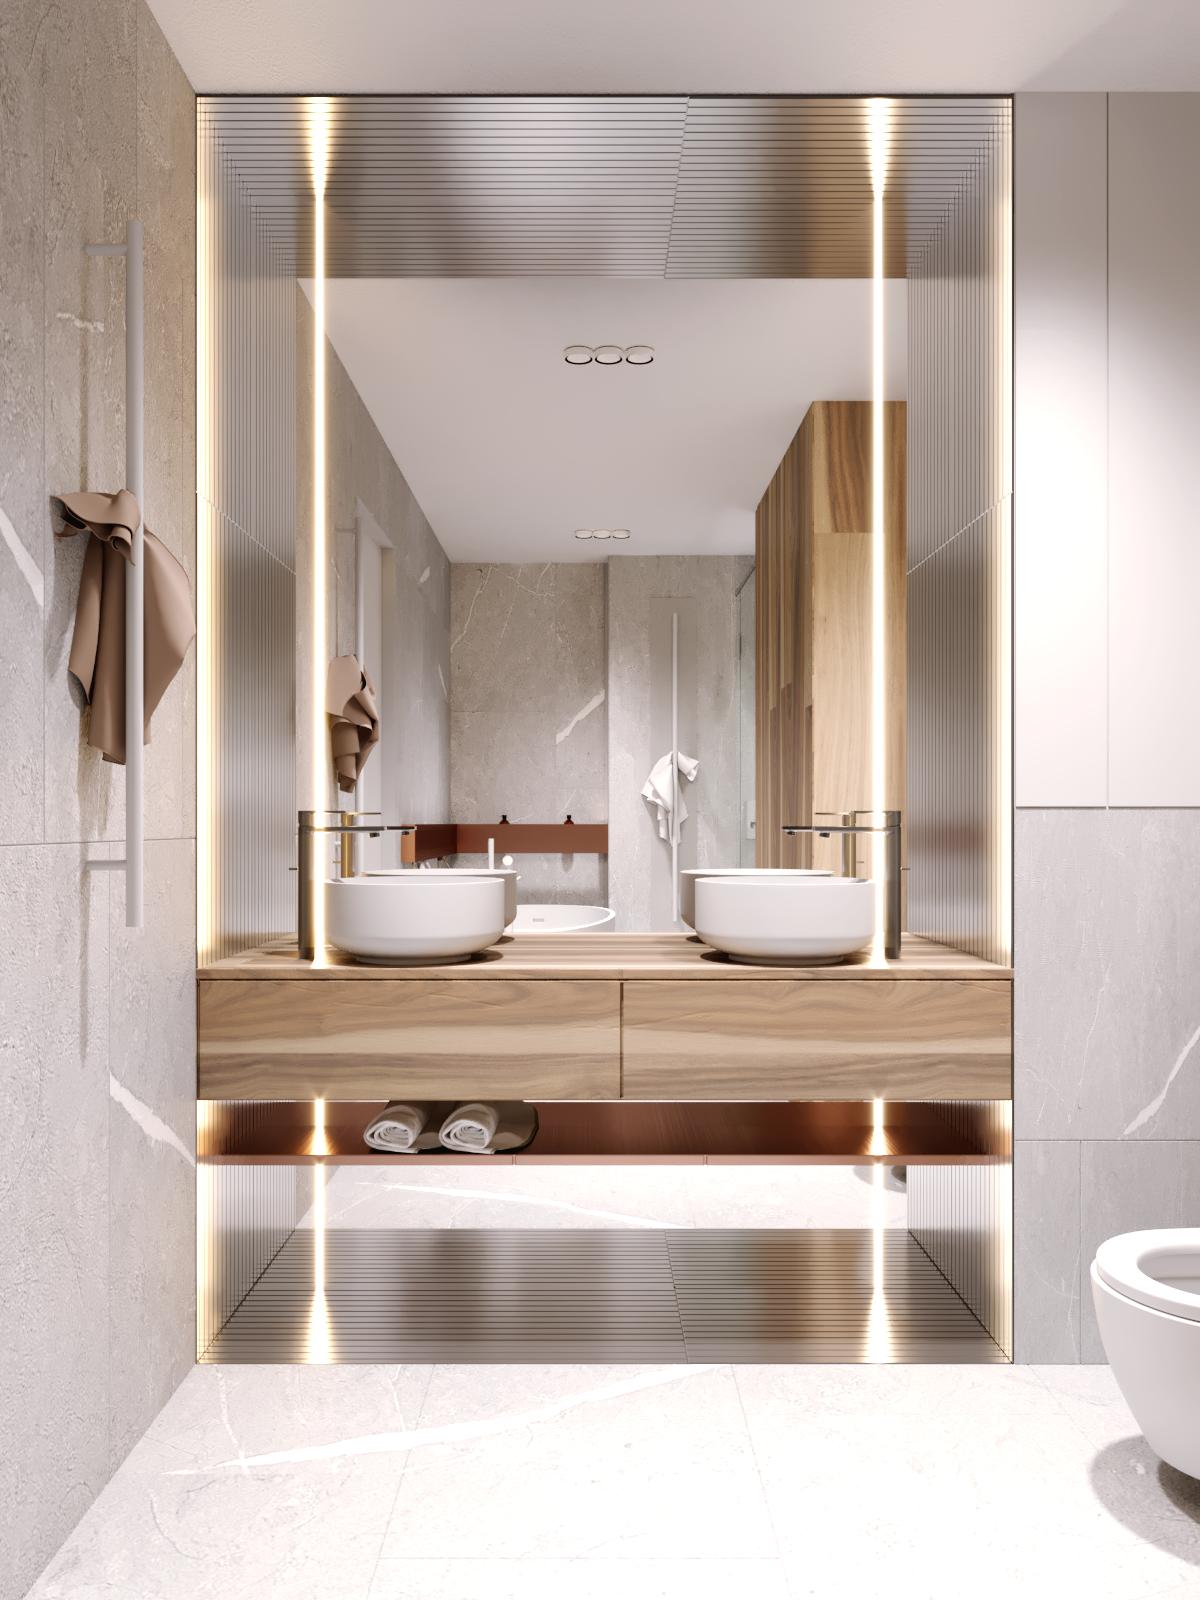 COCOON bathroom vanity design inspiration   modern washbasins   high ...